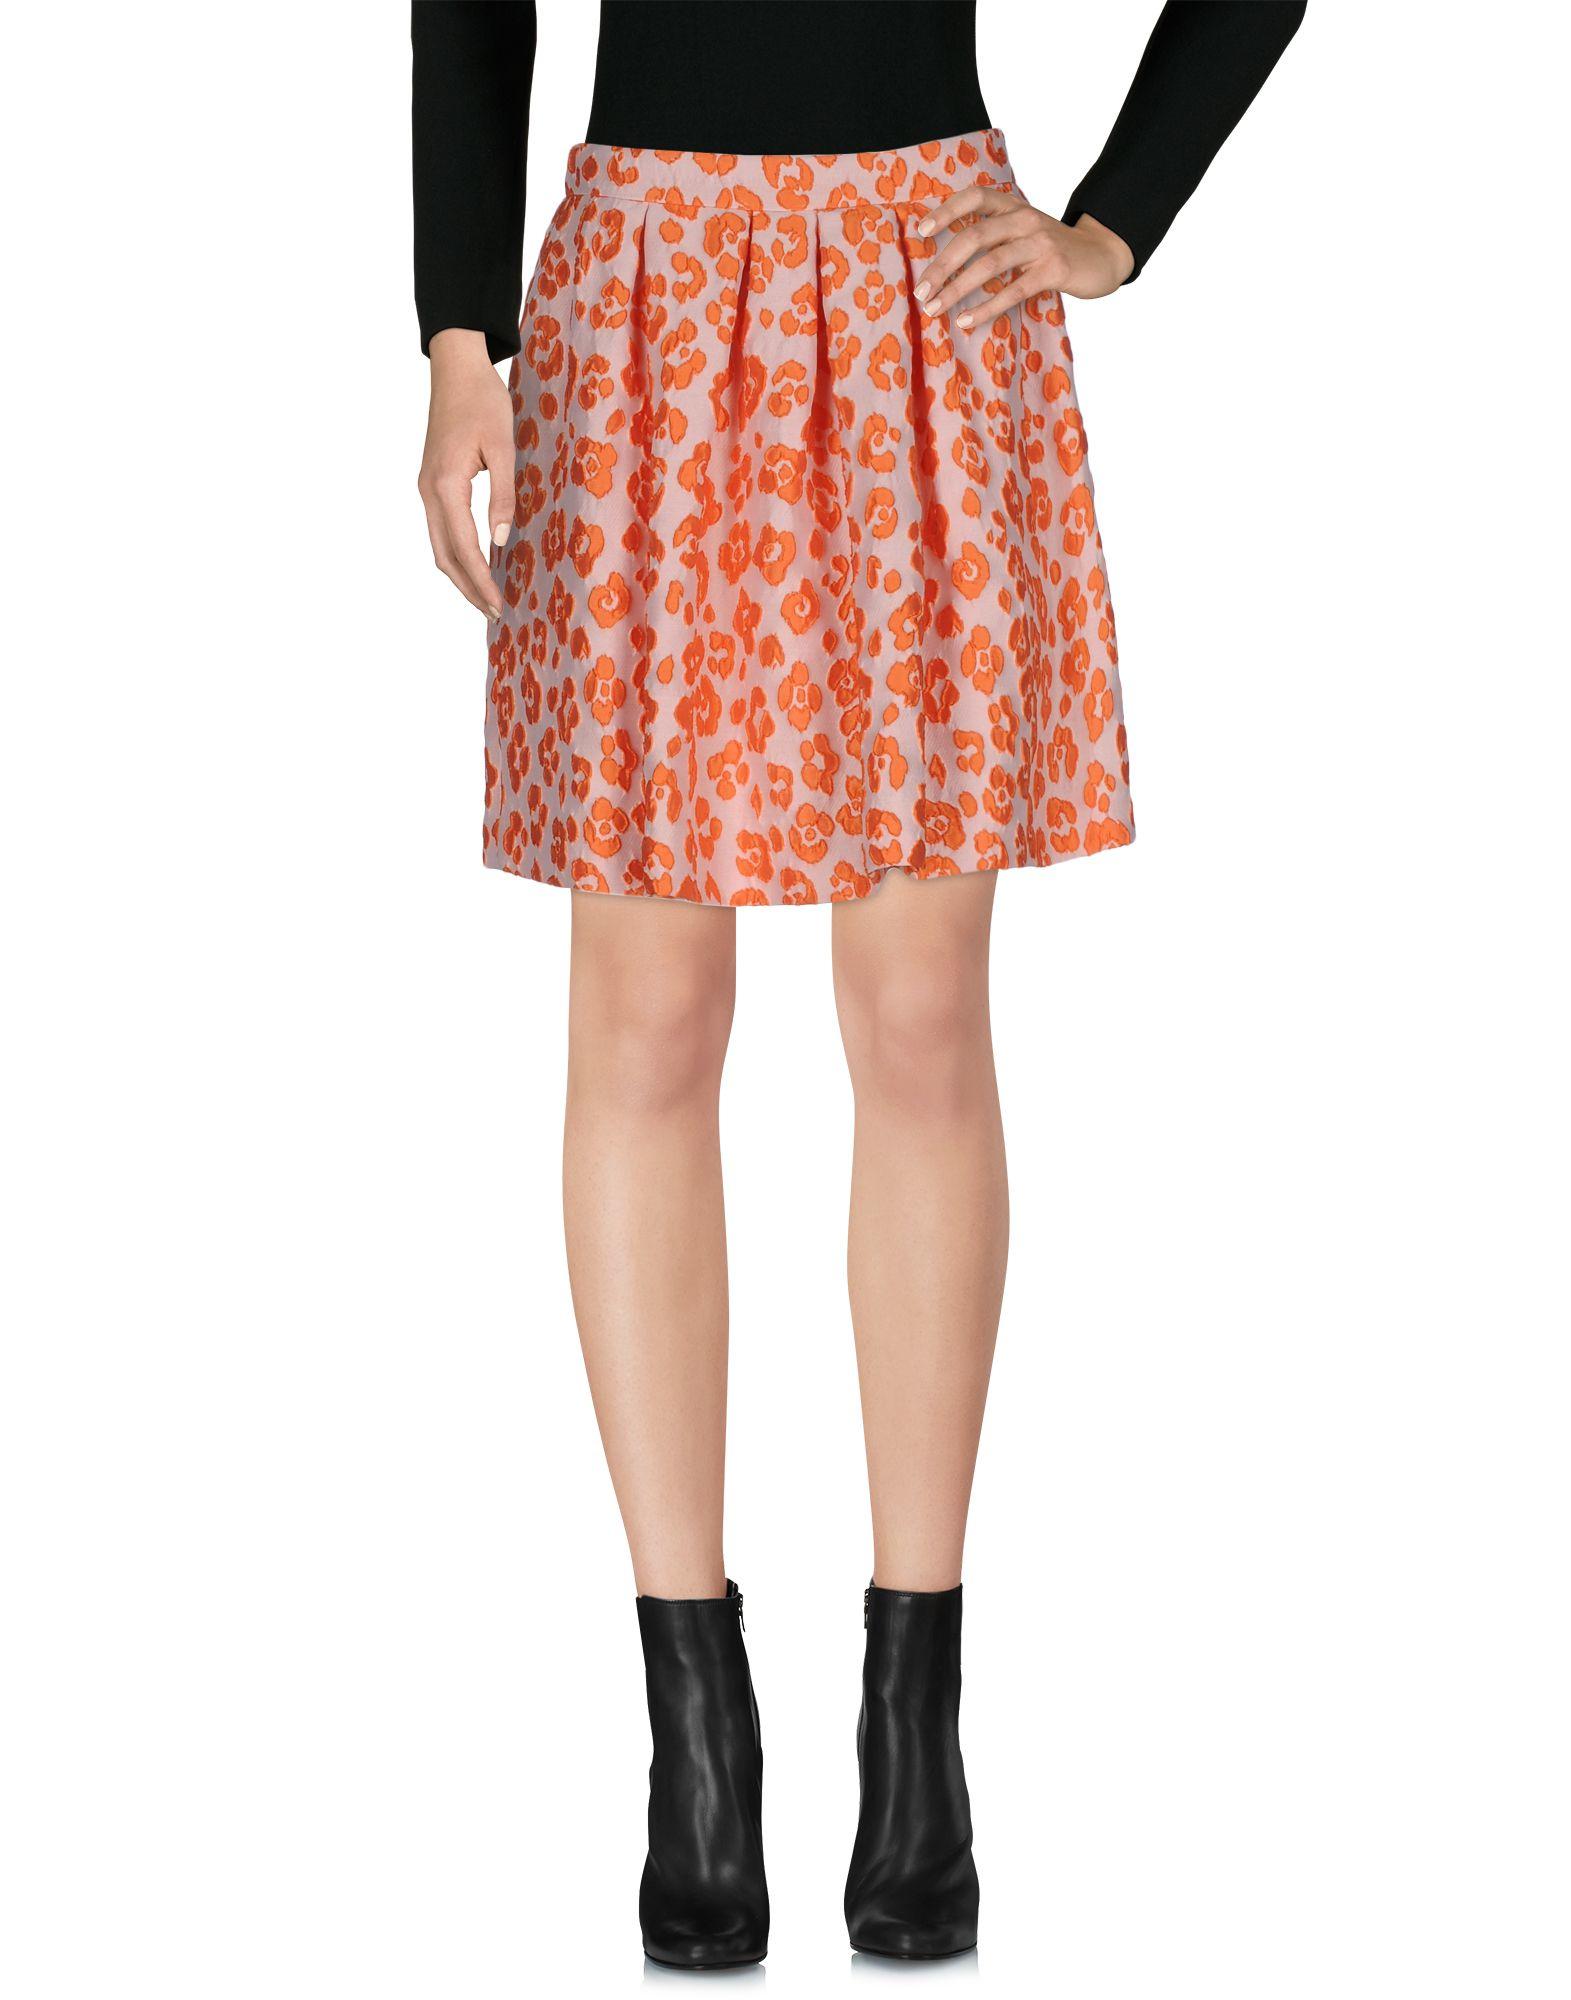 Boutique Skirt 117